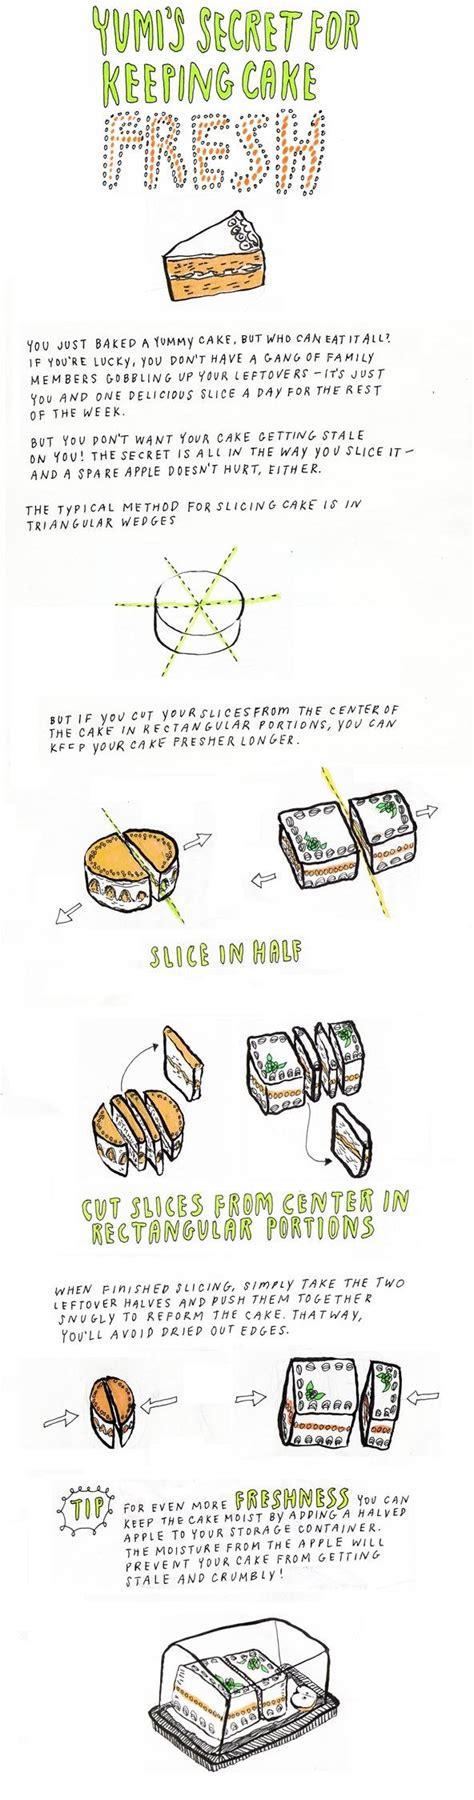 The Secret Keeping the secret to keeping cake fresh 171 the secret yumiverse